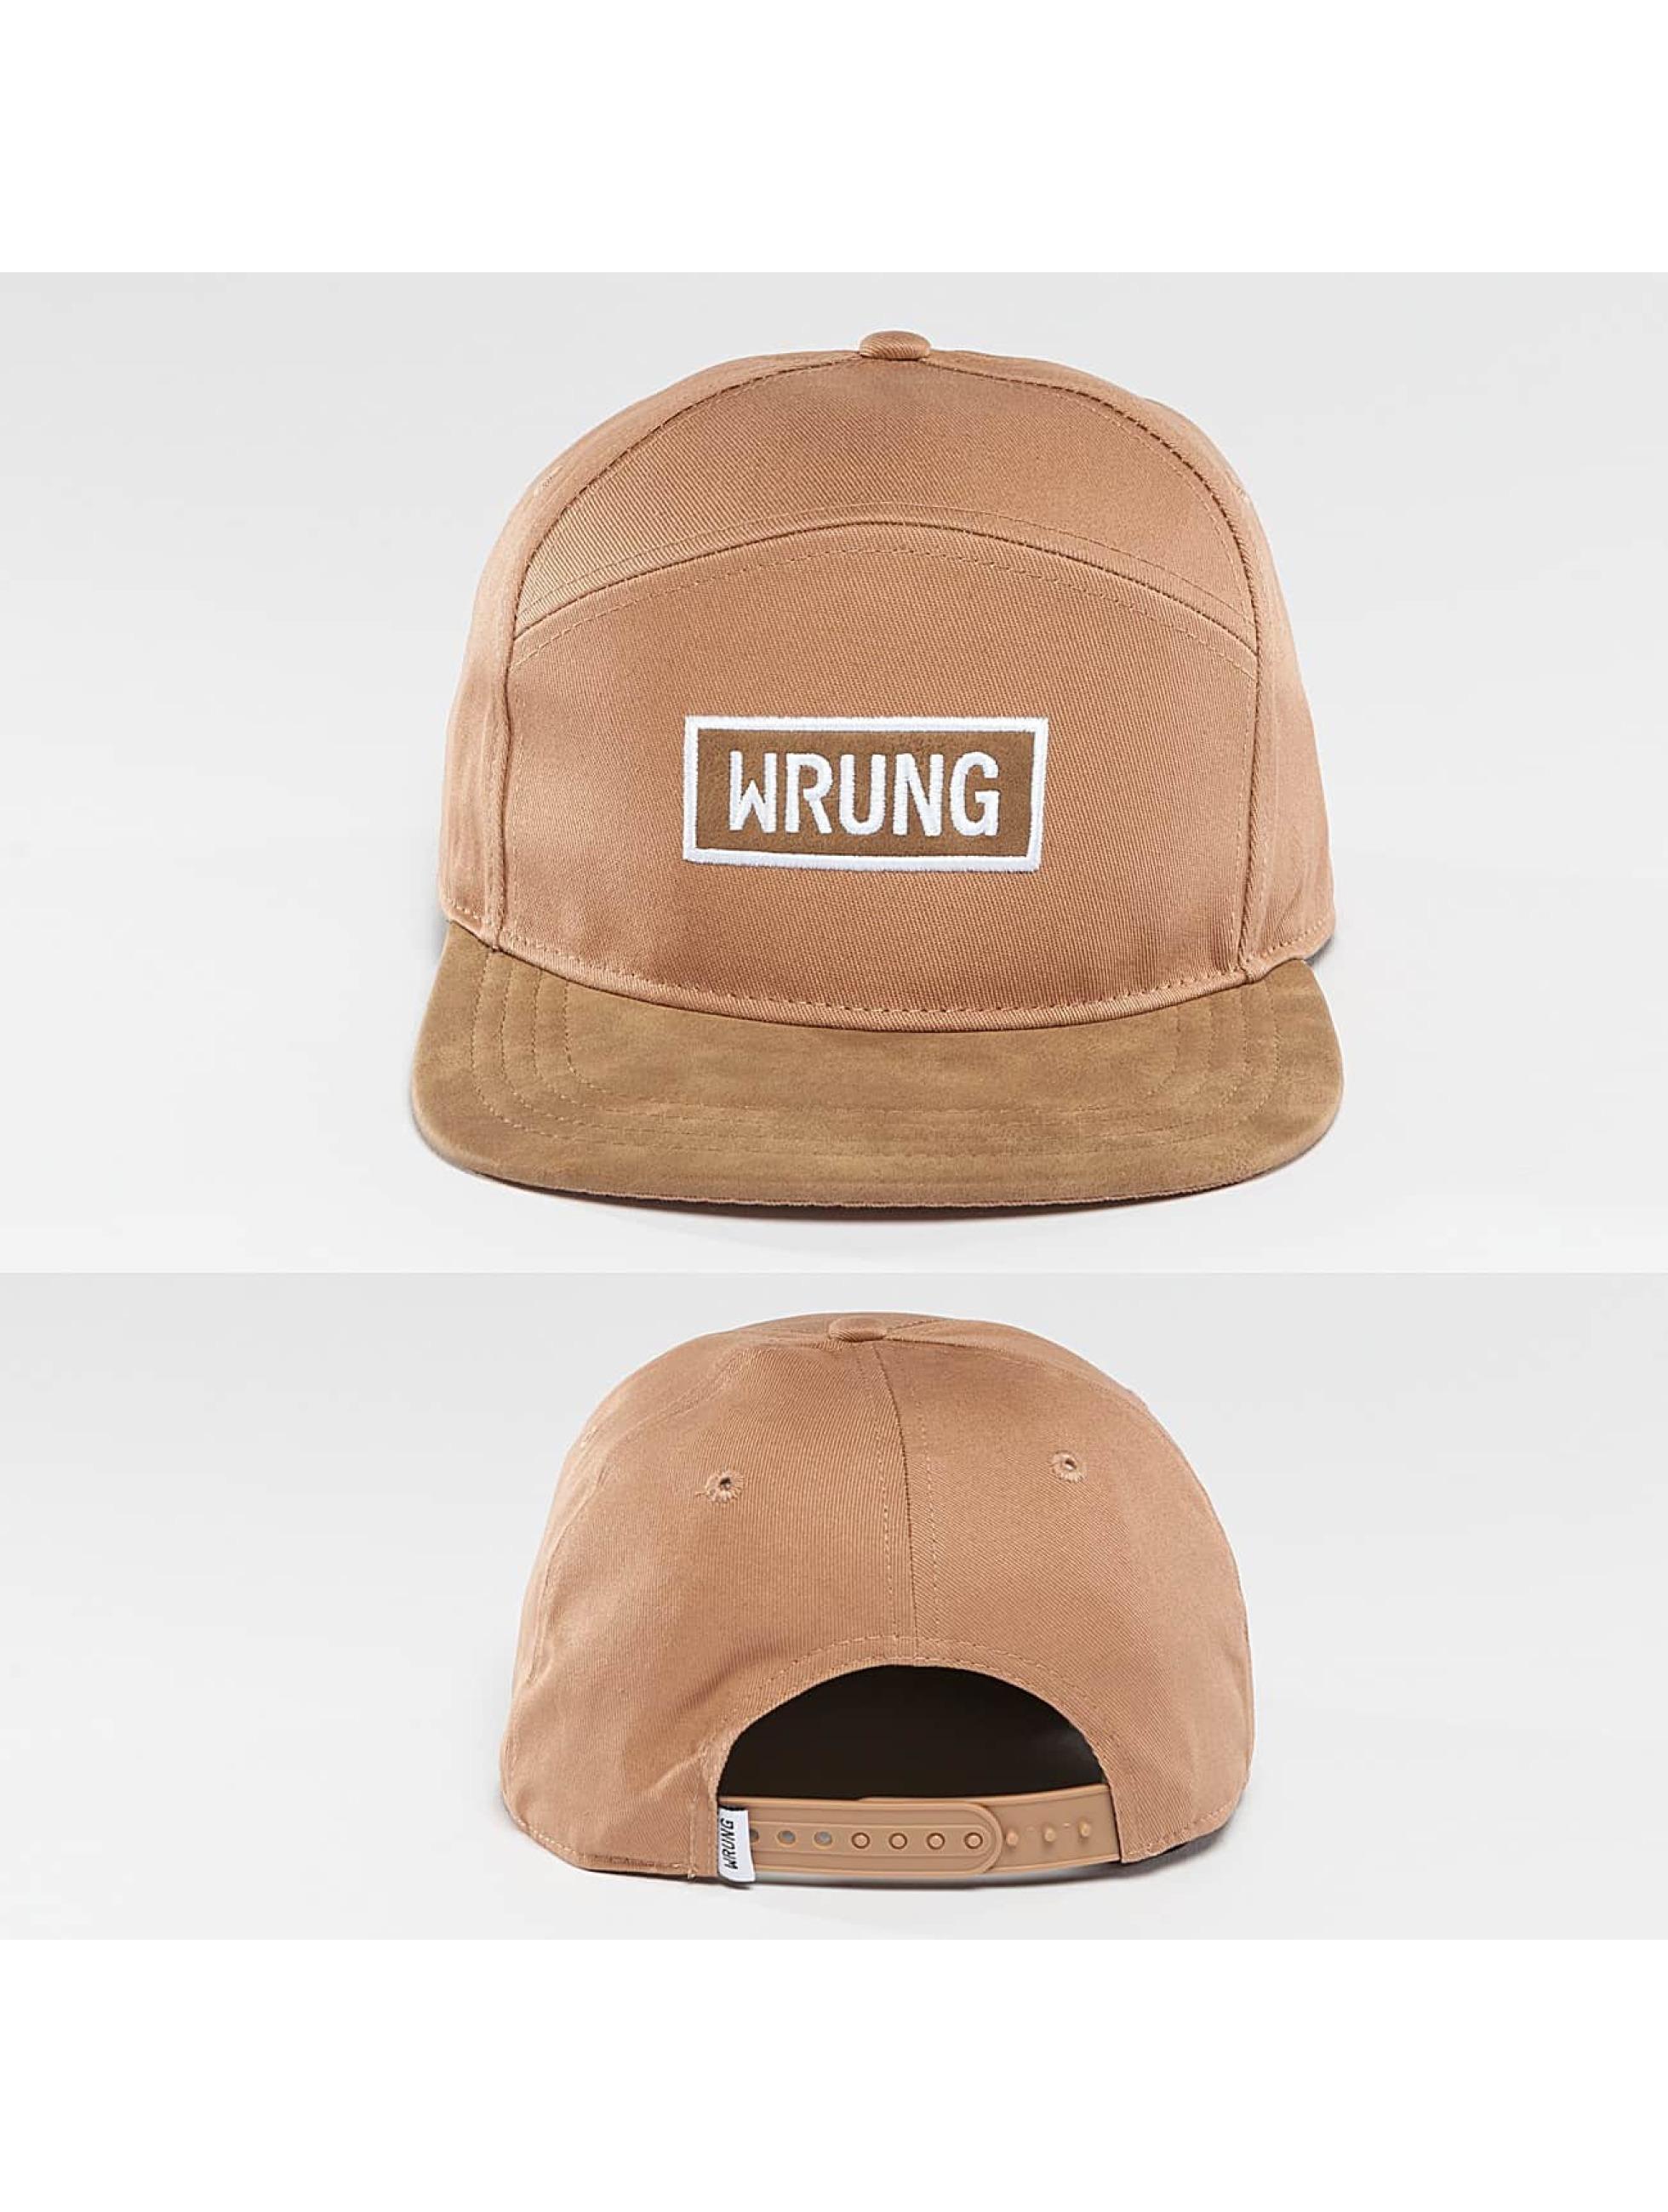 Wrung Division Männer,Frauen Snapback Cap Box in beige